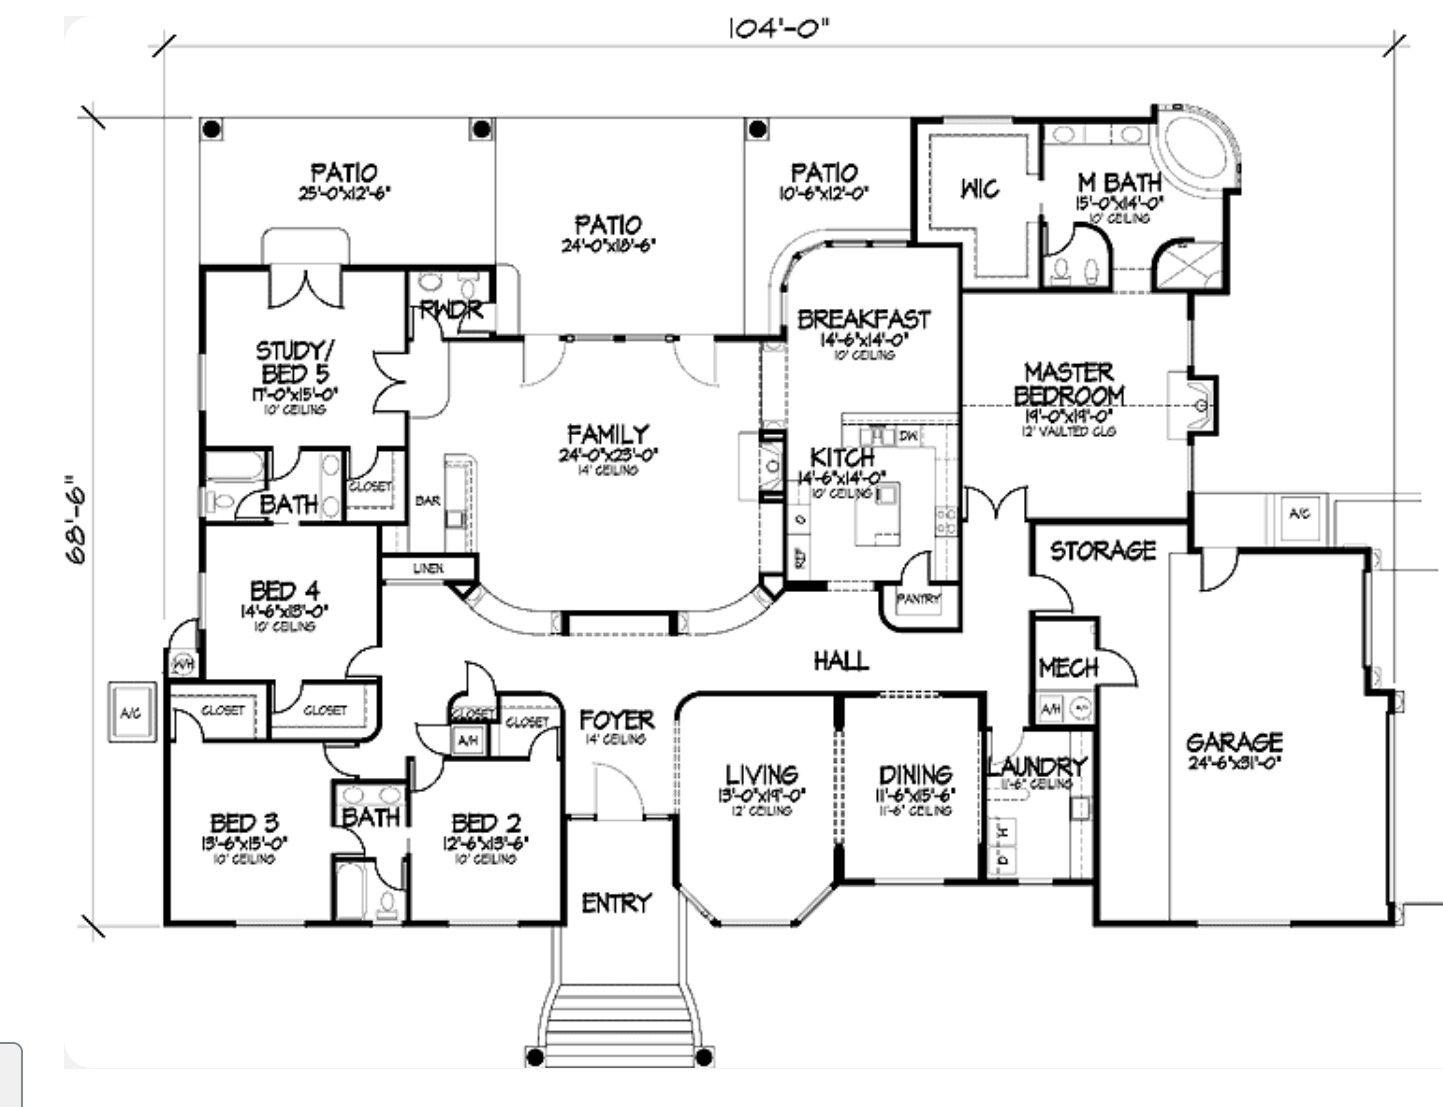 Pin by Rita susana on floor plan 5 bedroom house plans